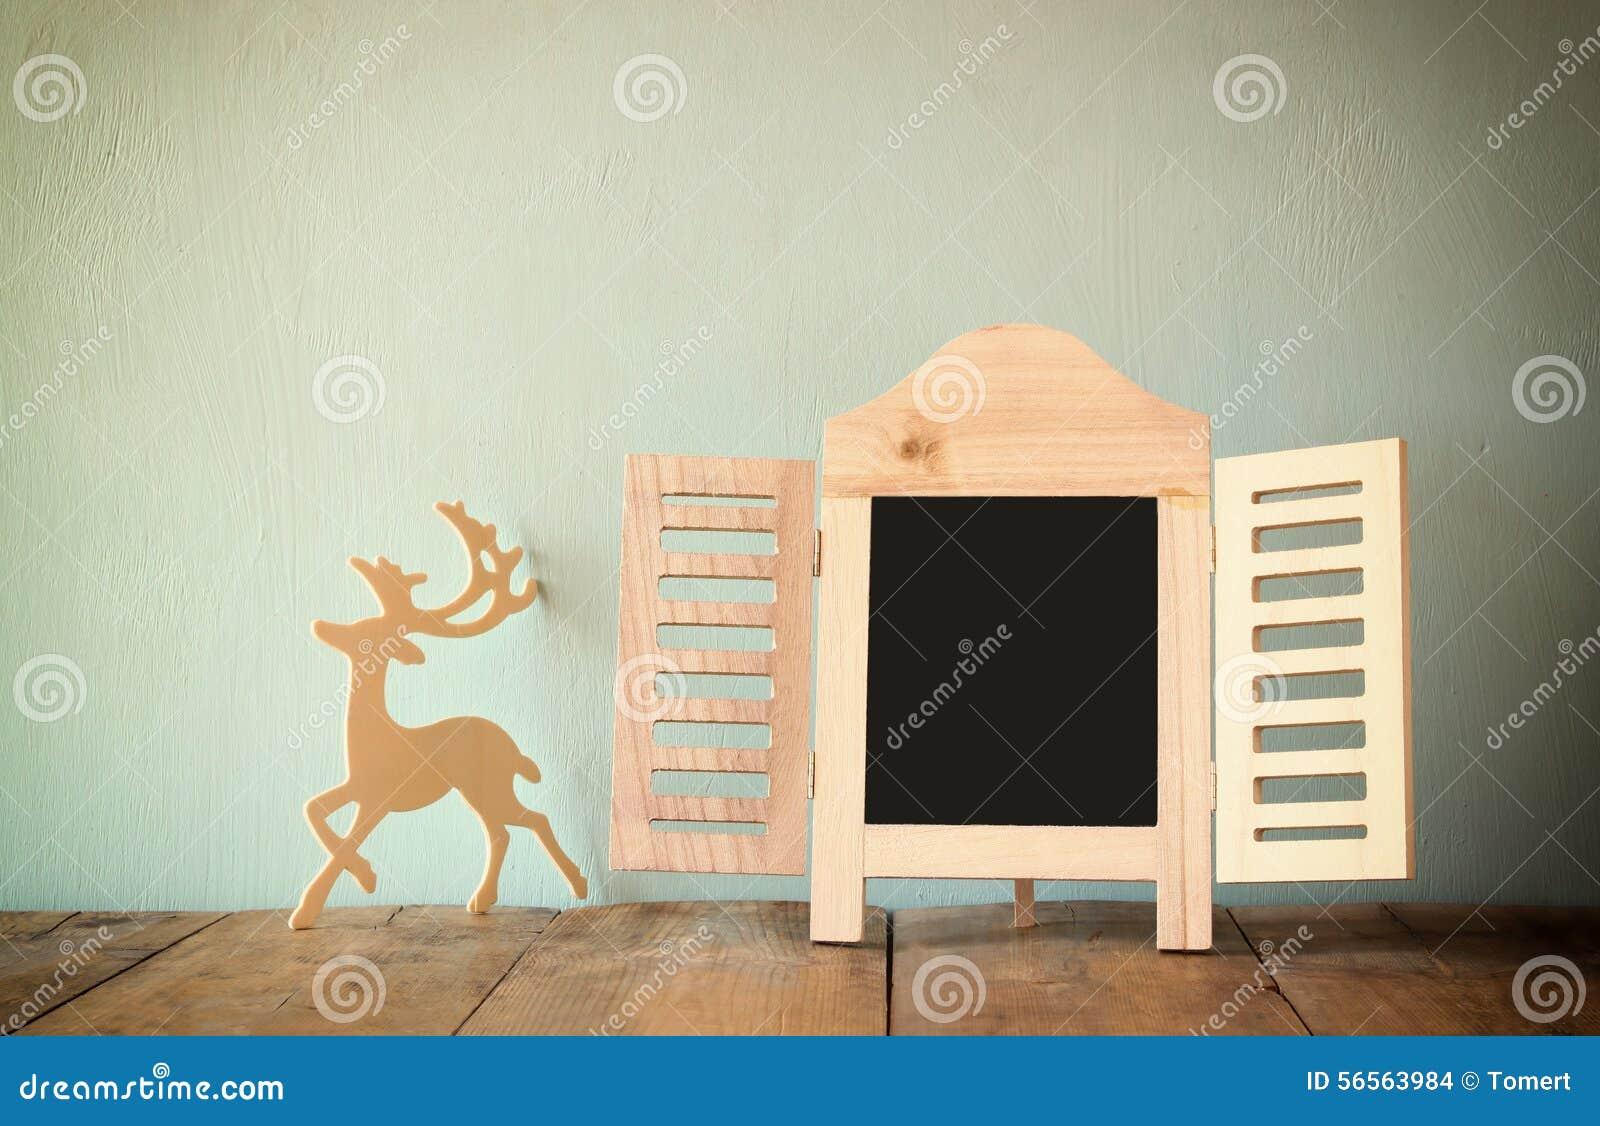 Download Η περίληψη φιλτράρισε τη φωτογραφία του διακοσμητικού πλαισίου πινάκων κιμωλίας και των ξύλινων ελαφιών πέρα από τον ξύλινο πίνακ Στοκ Εικόνες - εικόνα από ήπια, οικογένεια: 56563984